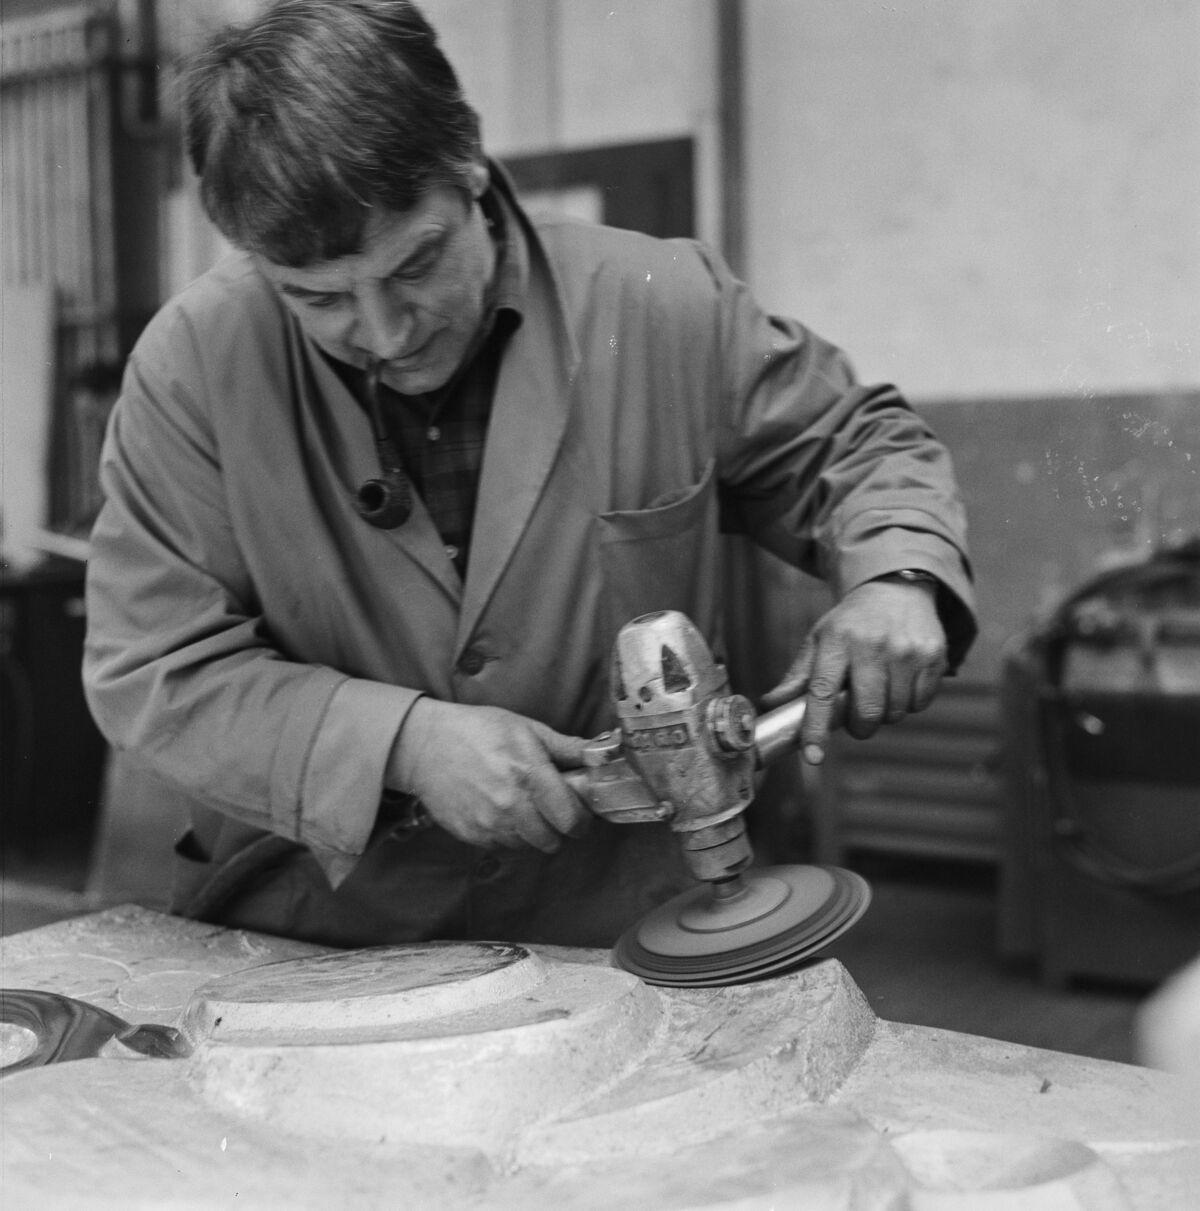 GFA 17/690438.6: Reportage: Manufacture of an aluminium sculpture